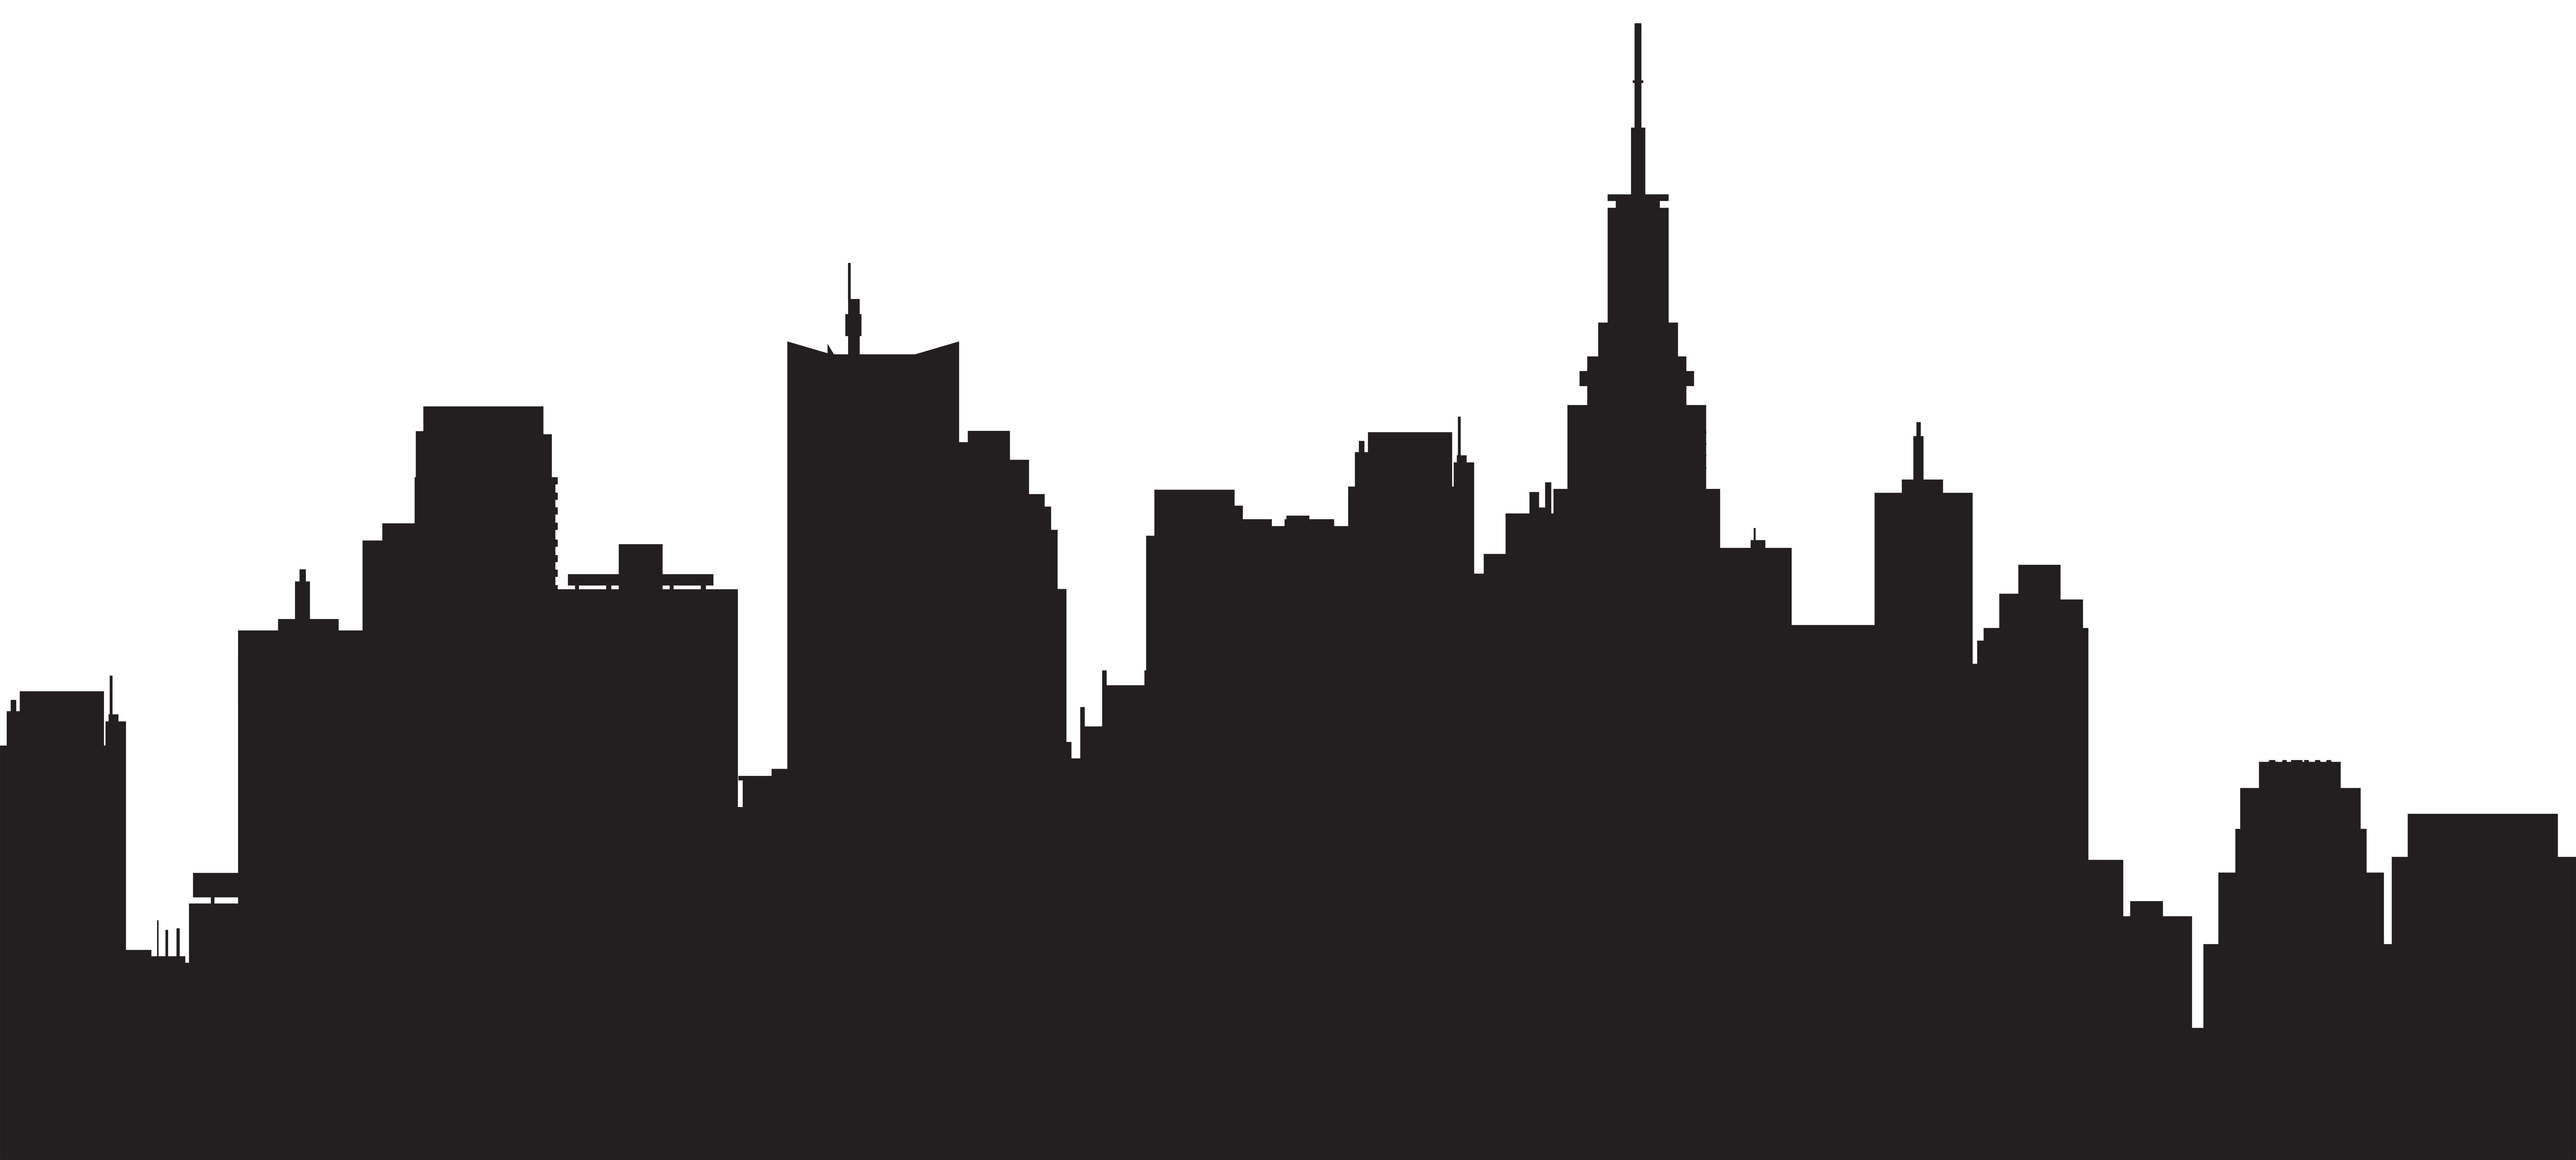 New York City Silhouette Skyline Clip art.